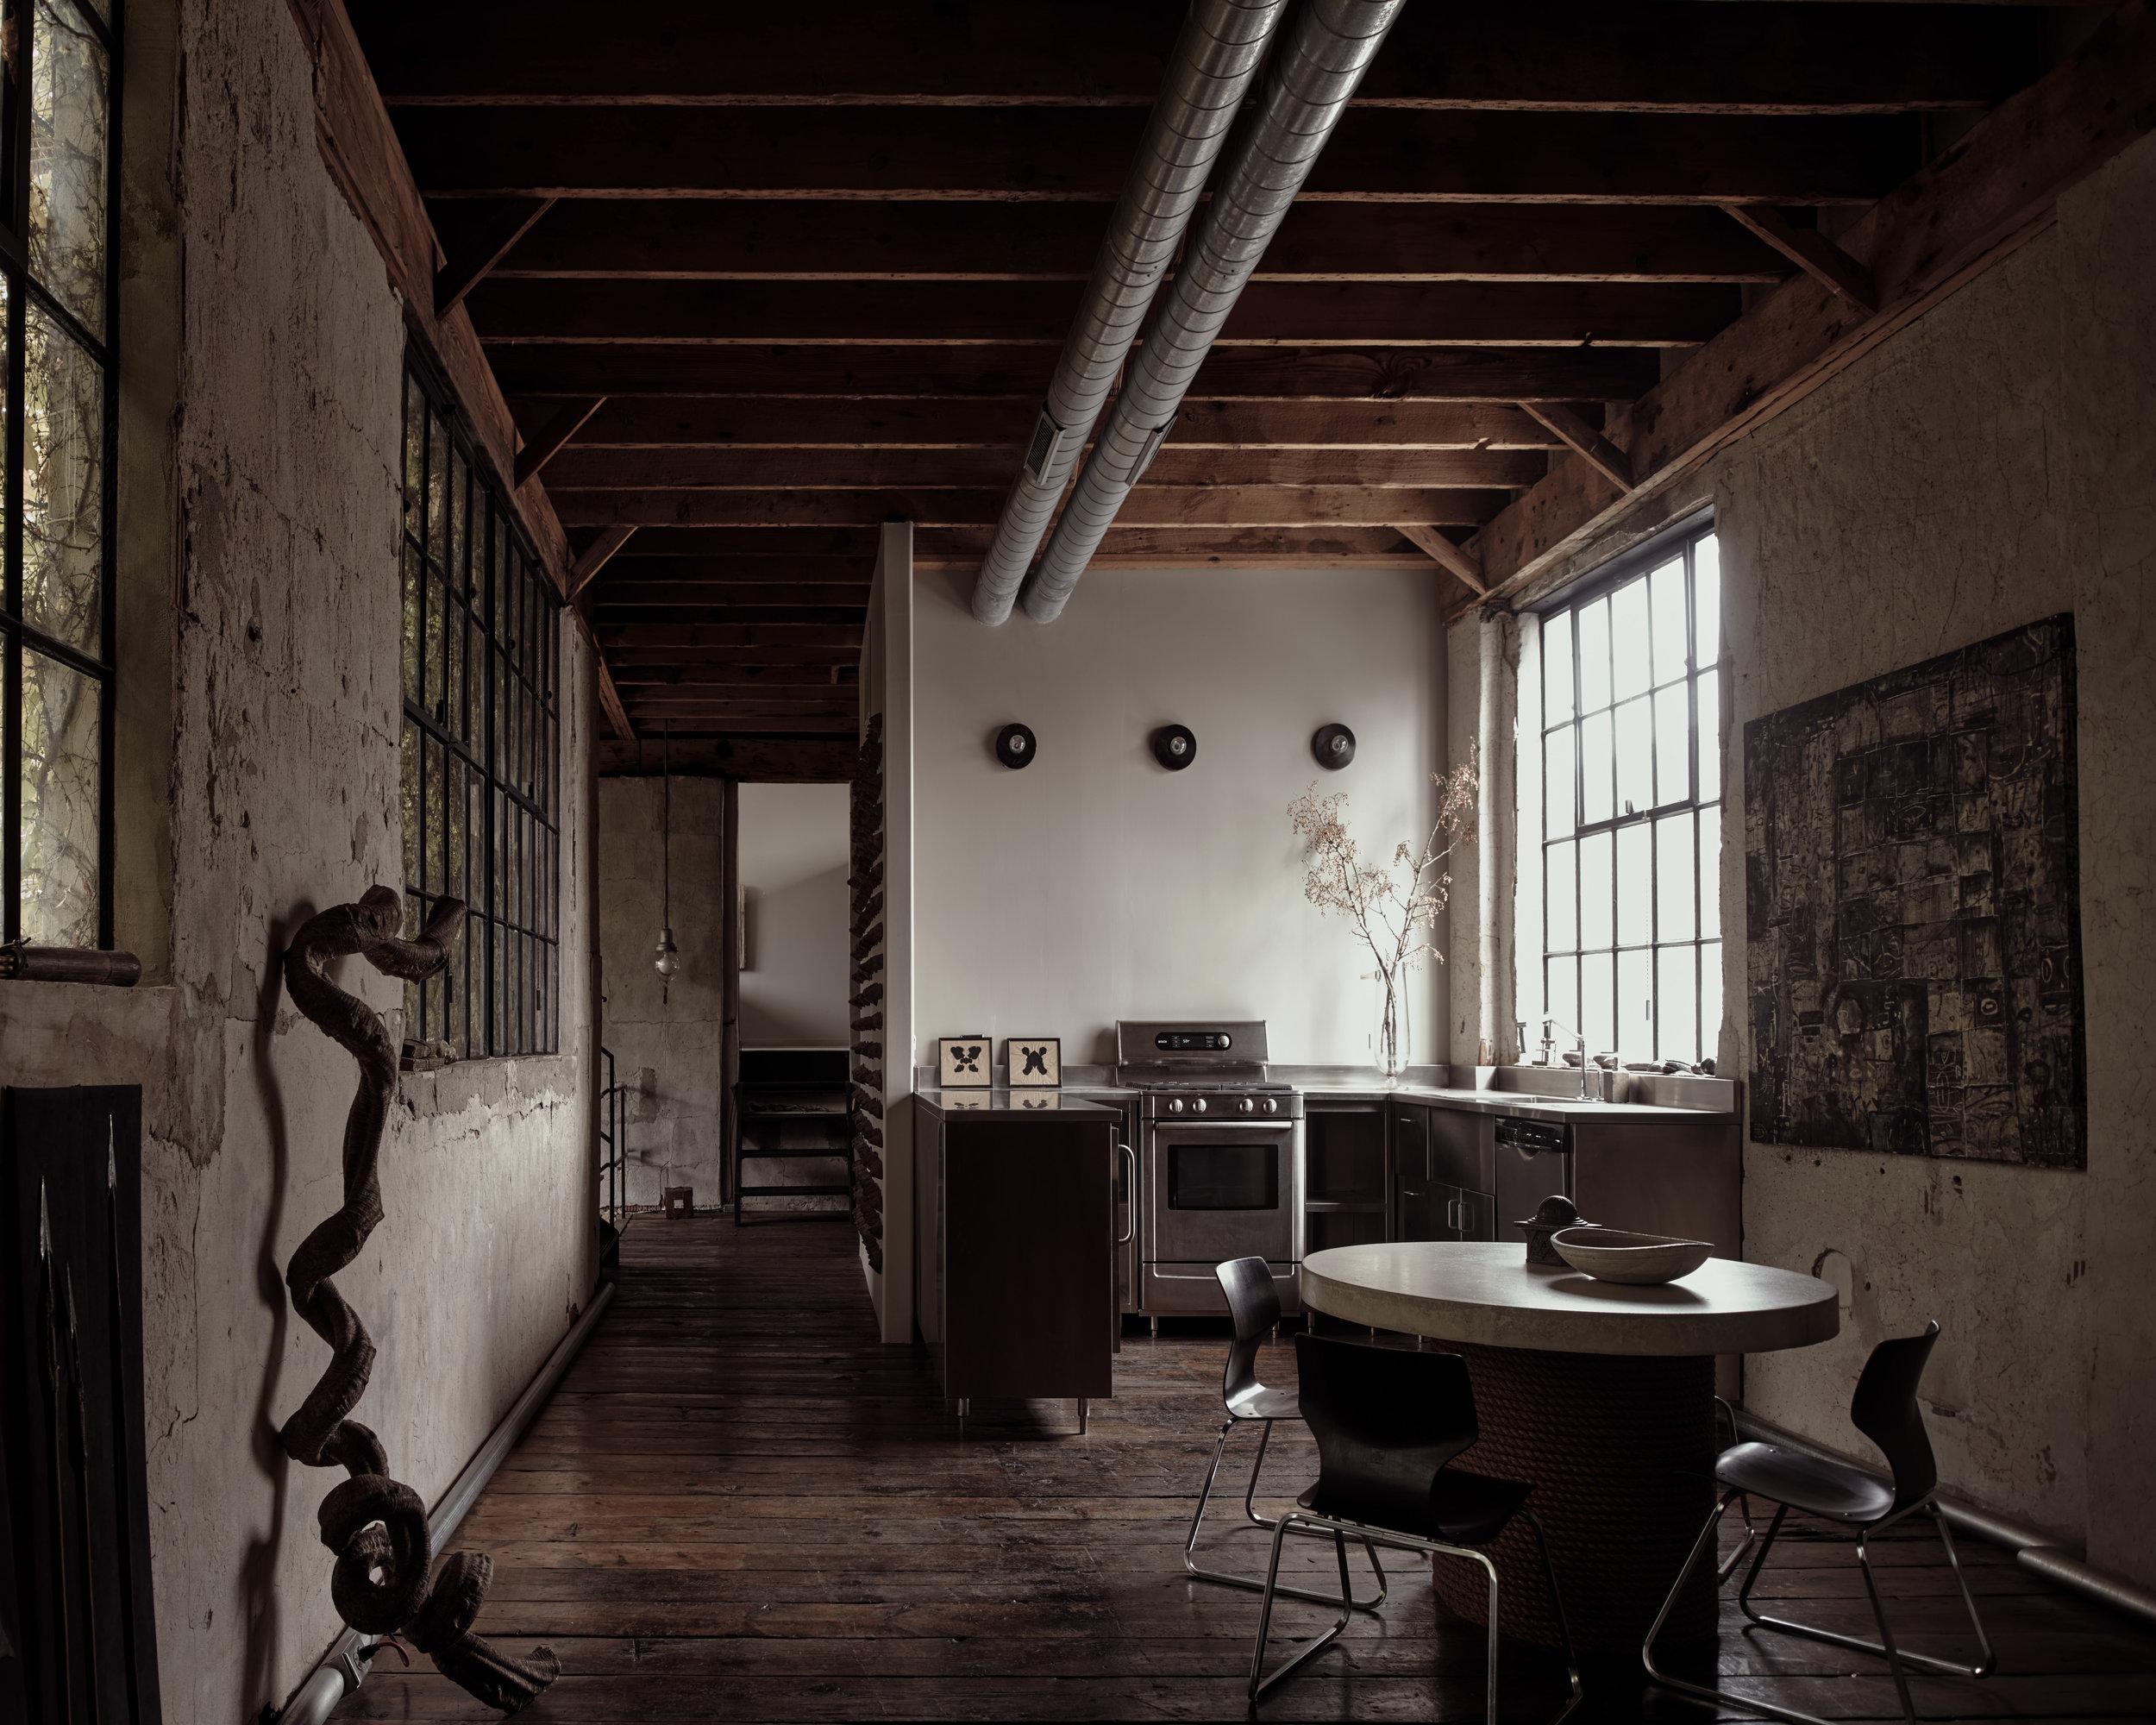 Architectural Artifacts owner Stewart Grennan's residence